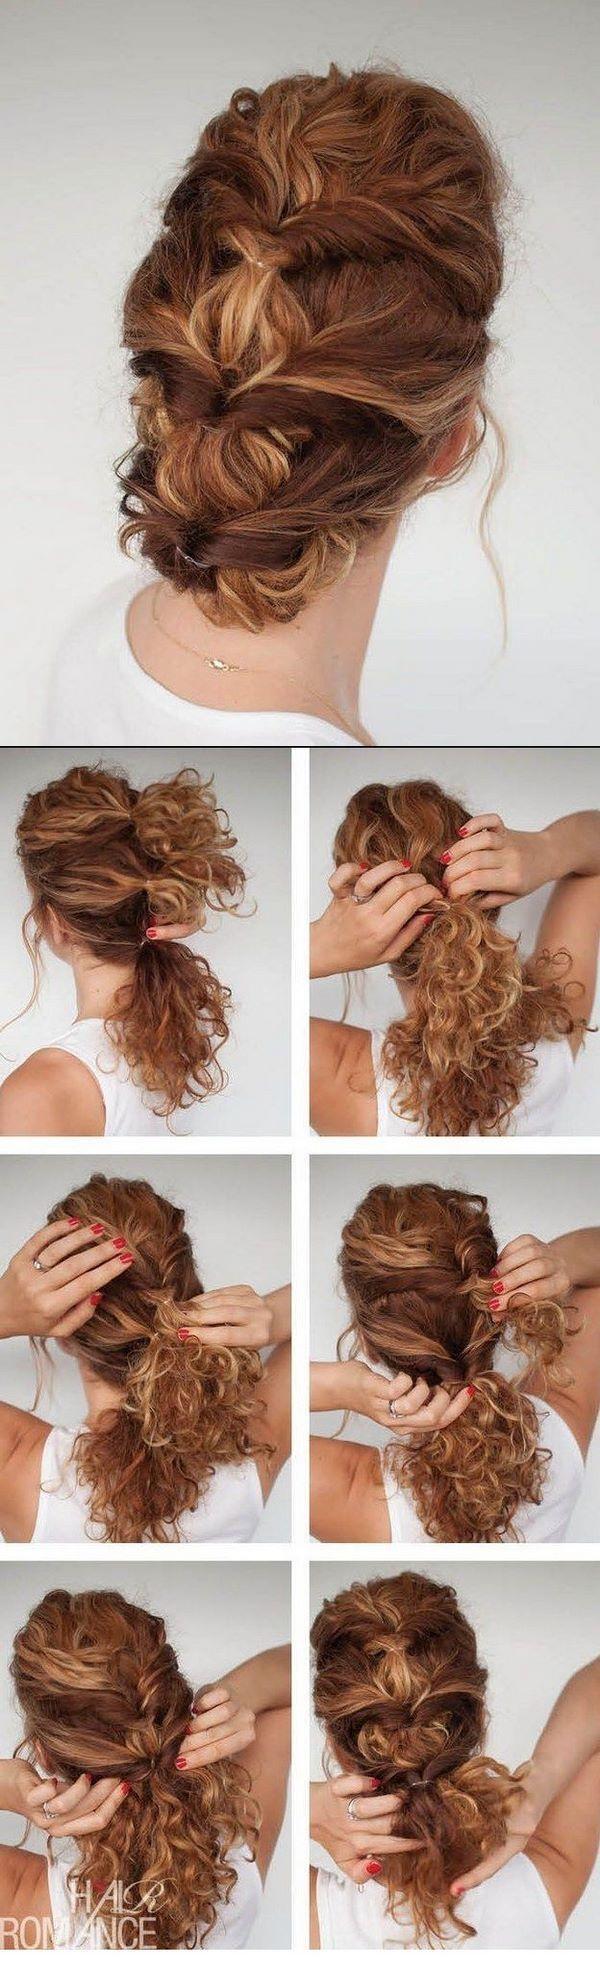 Night Hairstyles - Peinados de noche